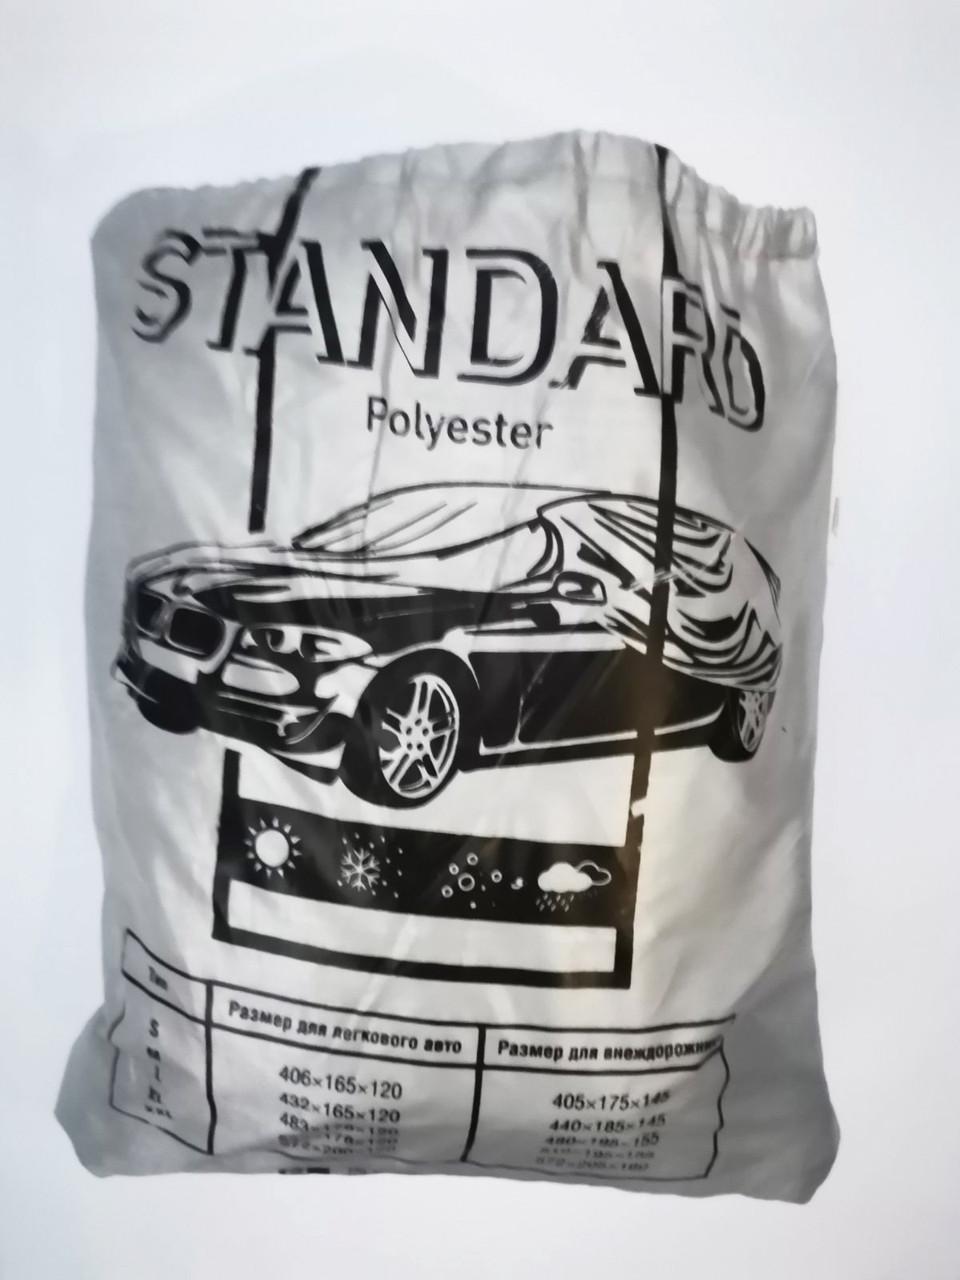 Тент авто седан Polyester L 483*178*120 STANDARD DK